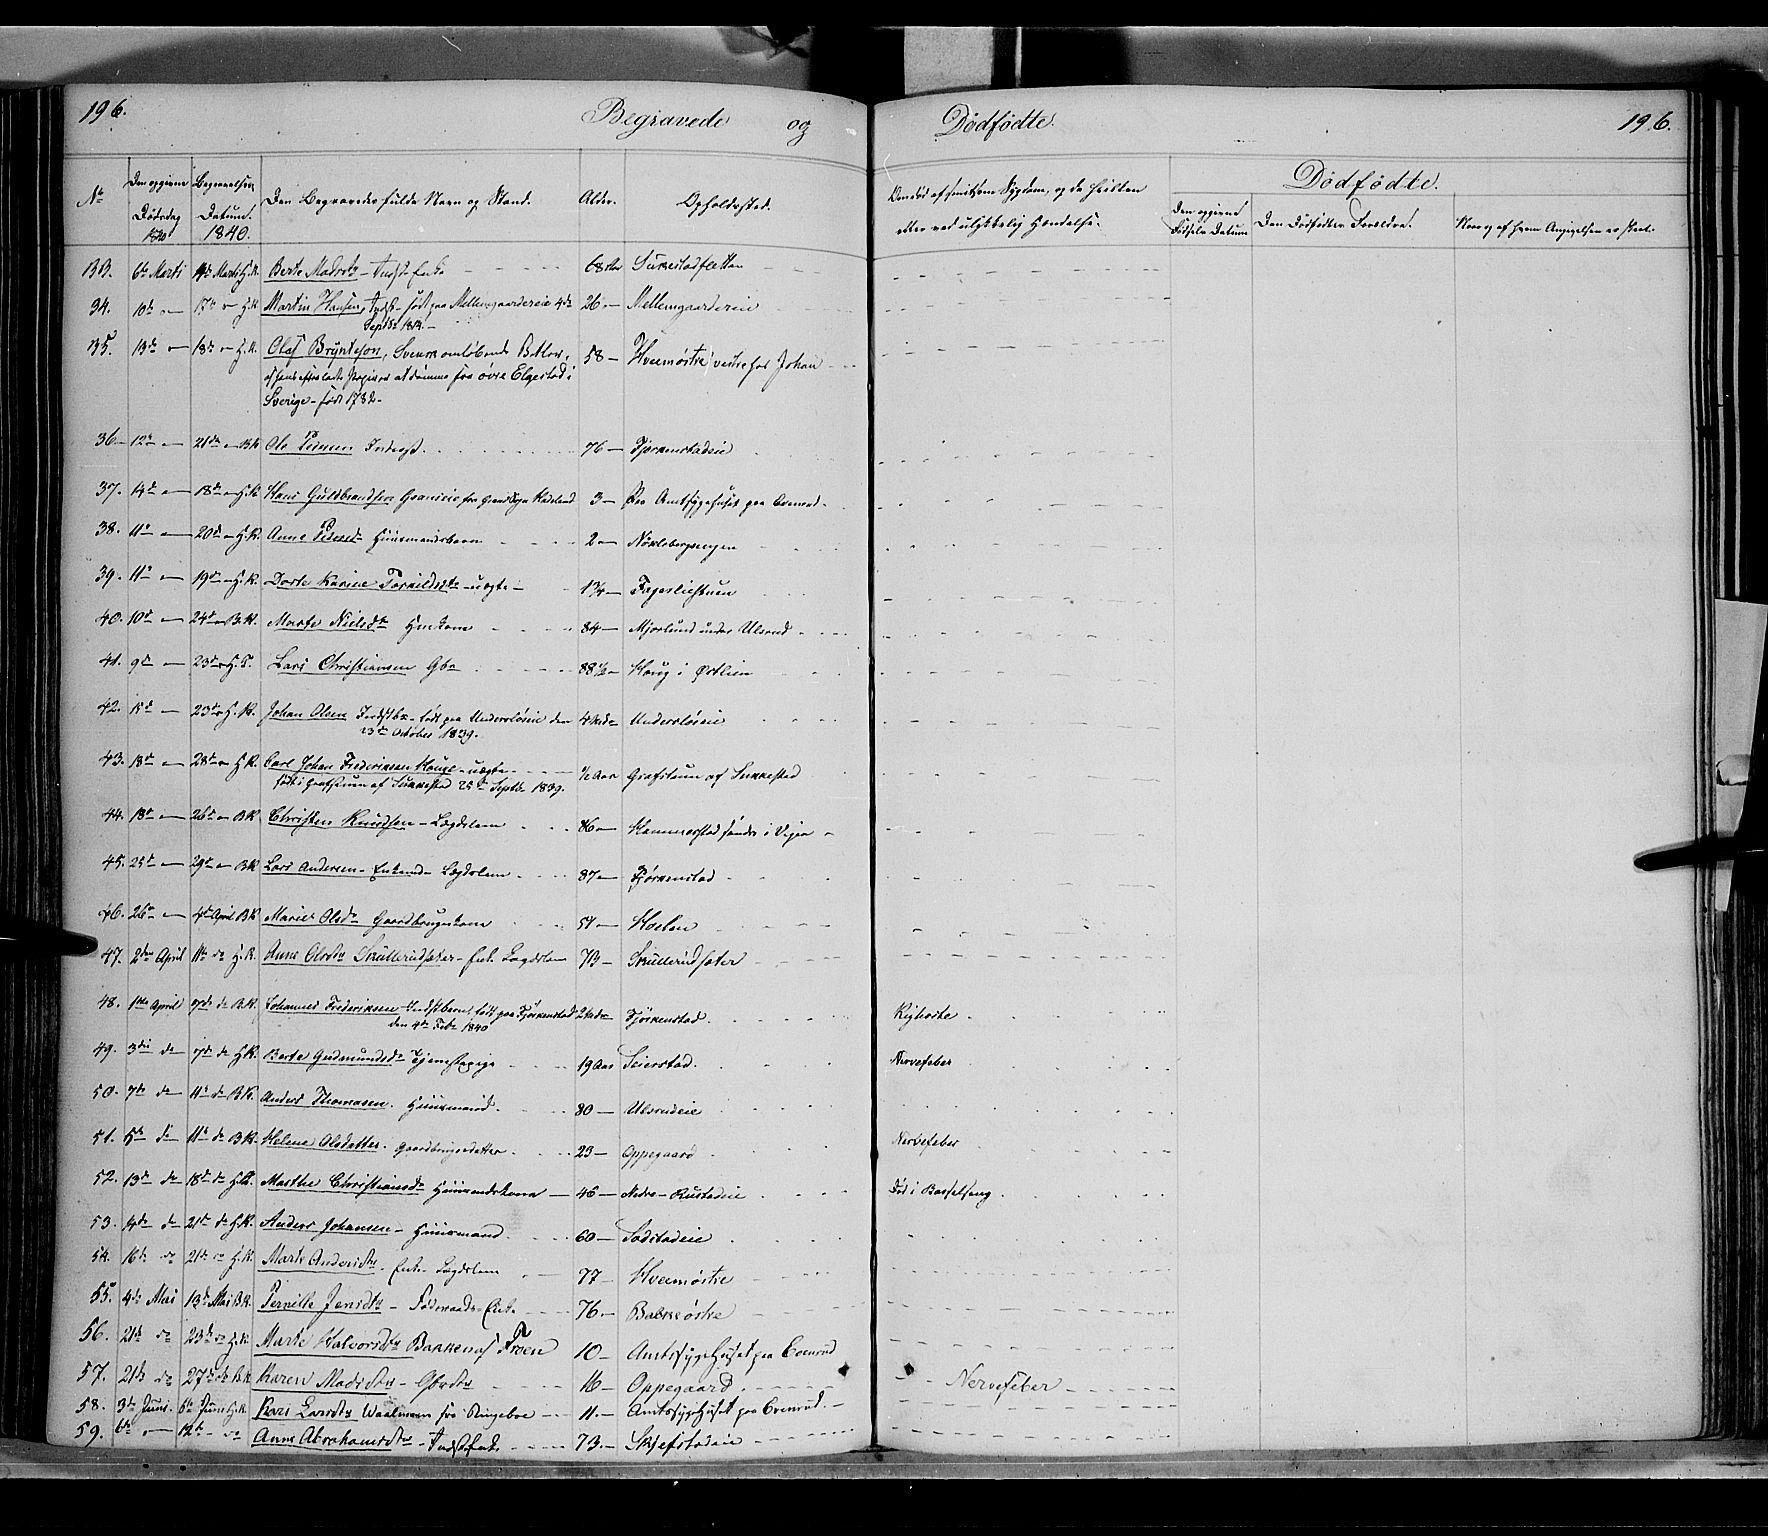 SAH, Østre Toten prestekontor, Ministerialbok nr. 2, 1840-1847, s. 196